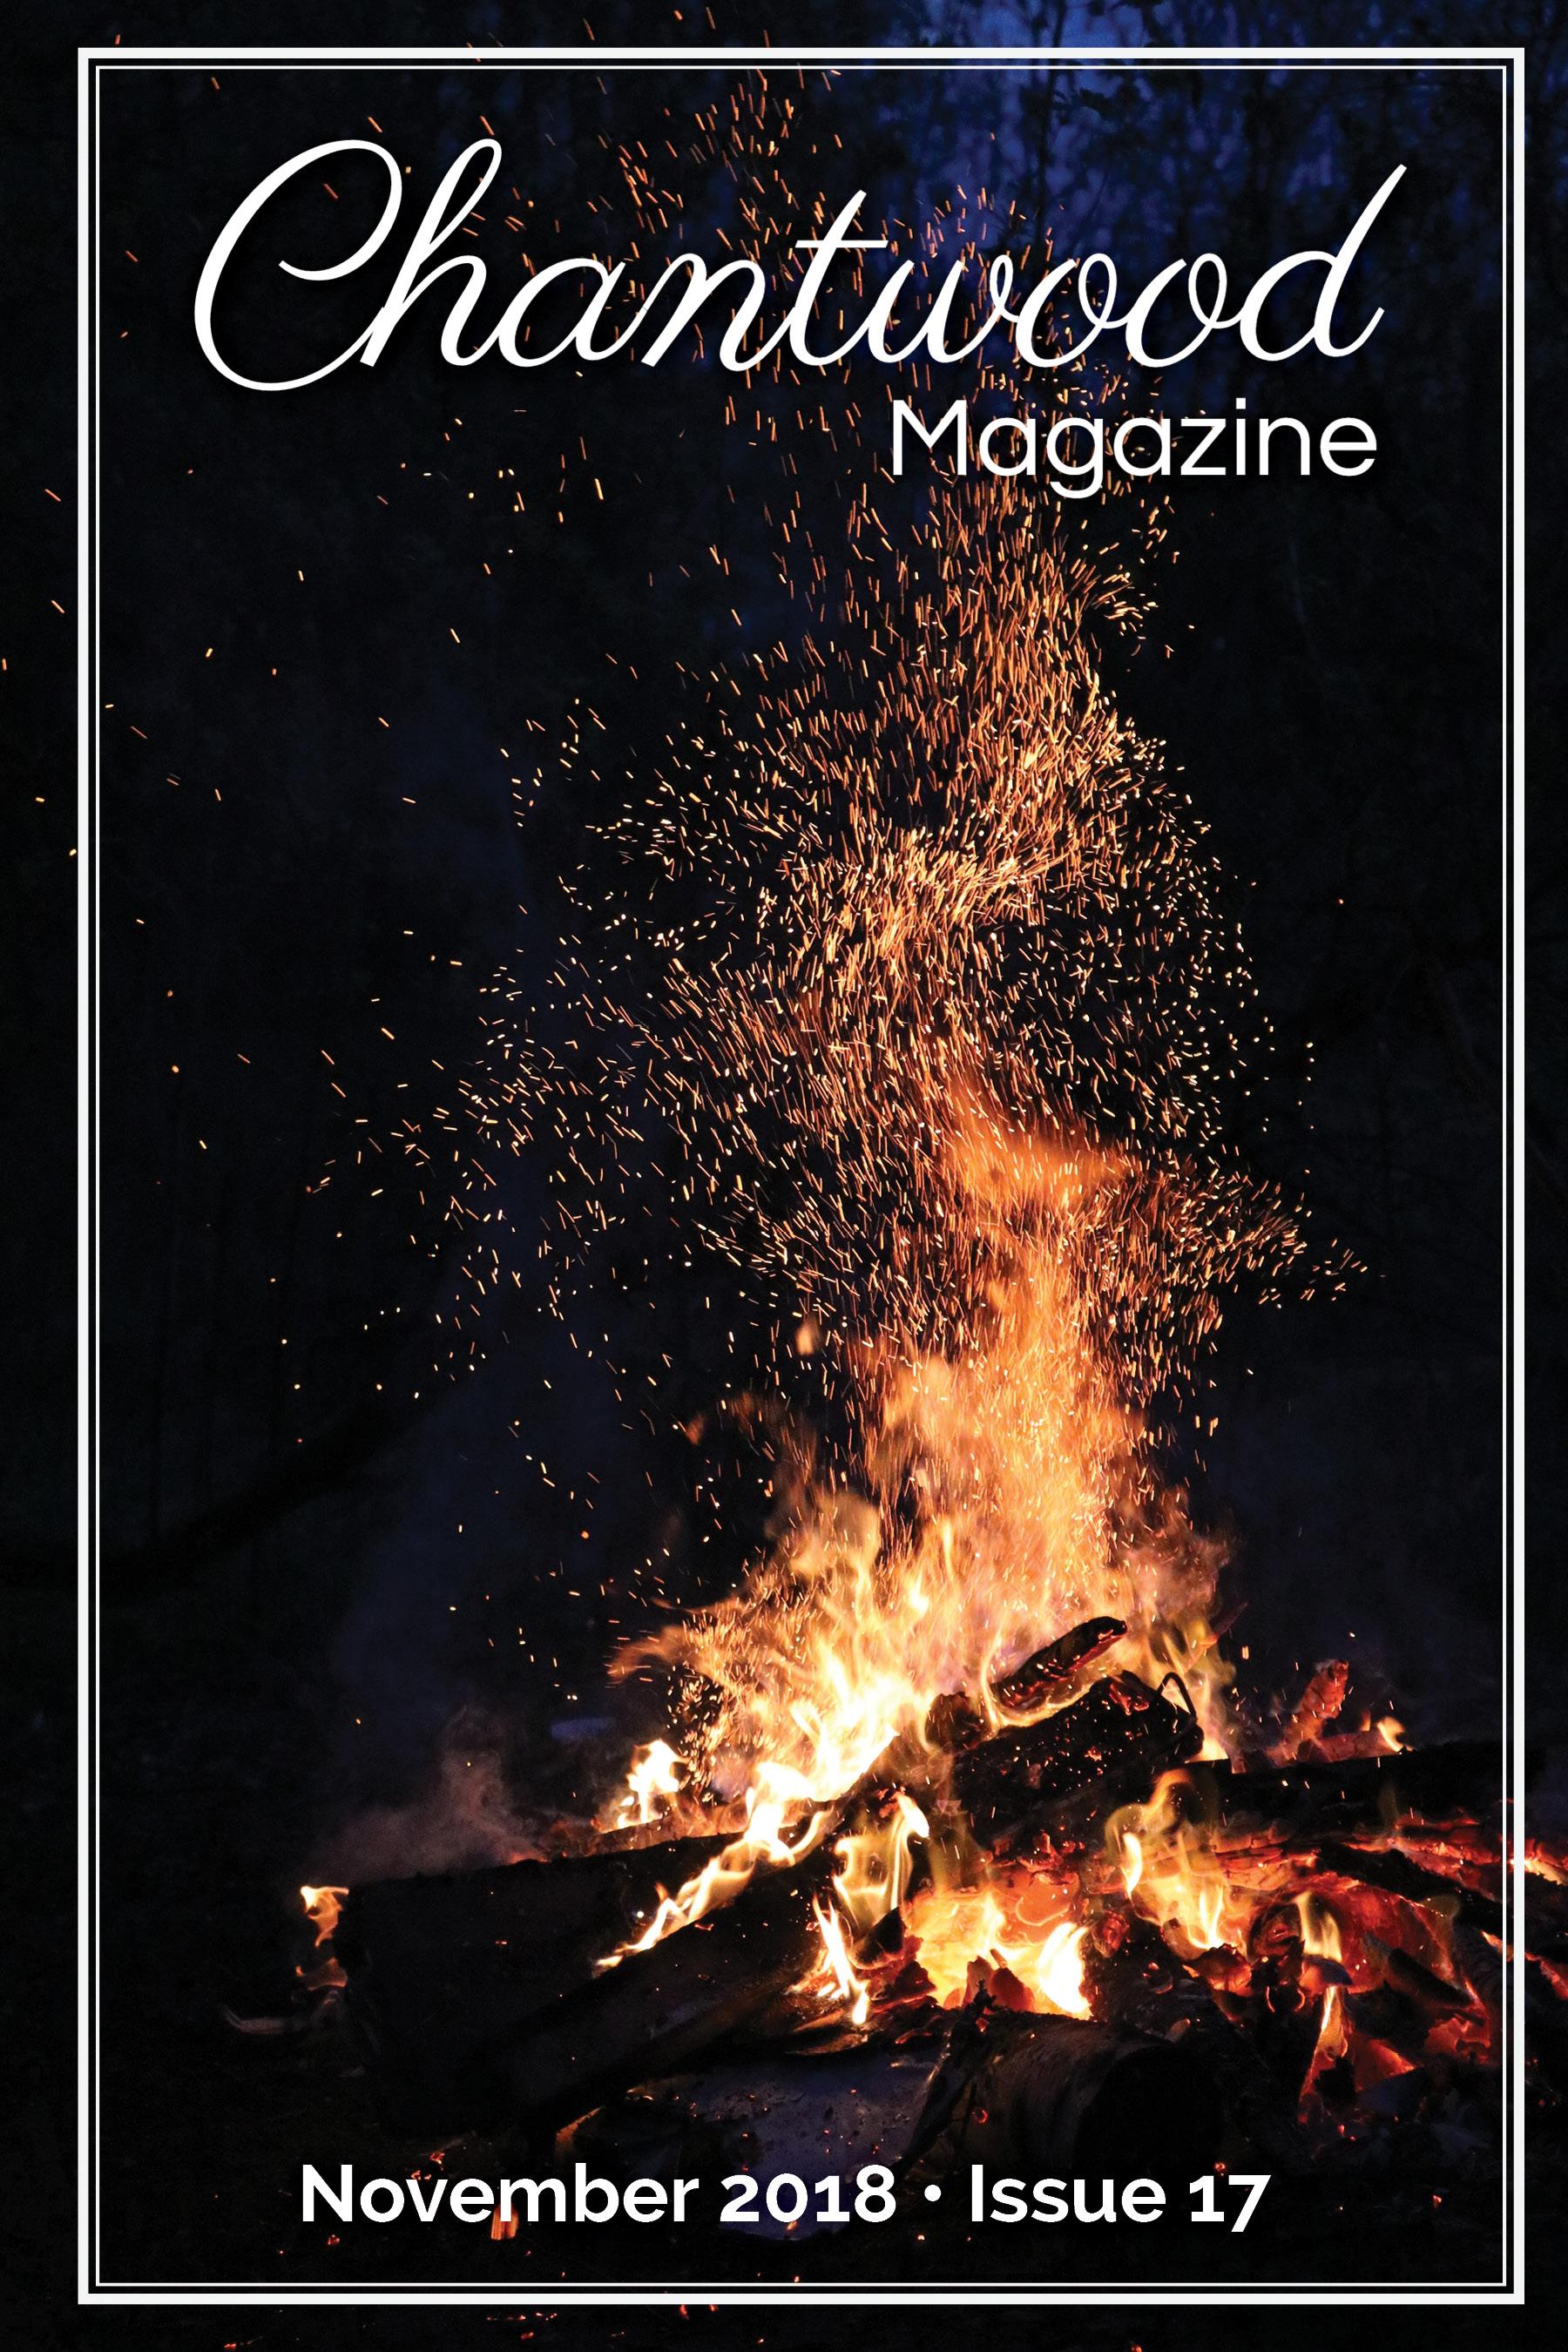 Chantwood Magazine November 2018 Cover.jpg